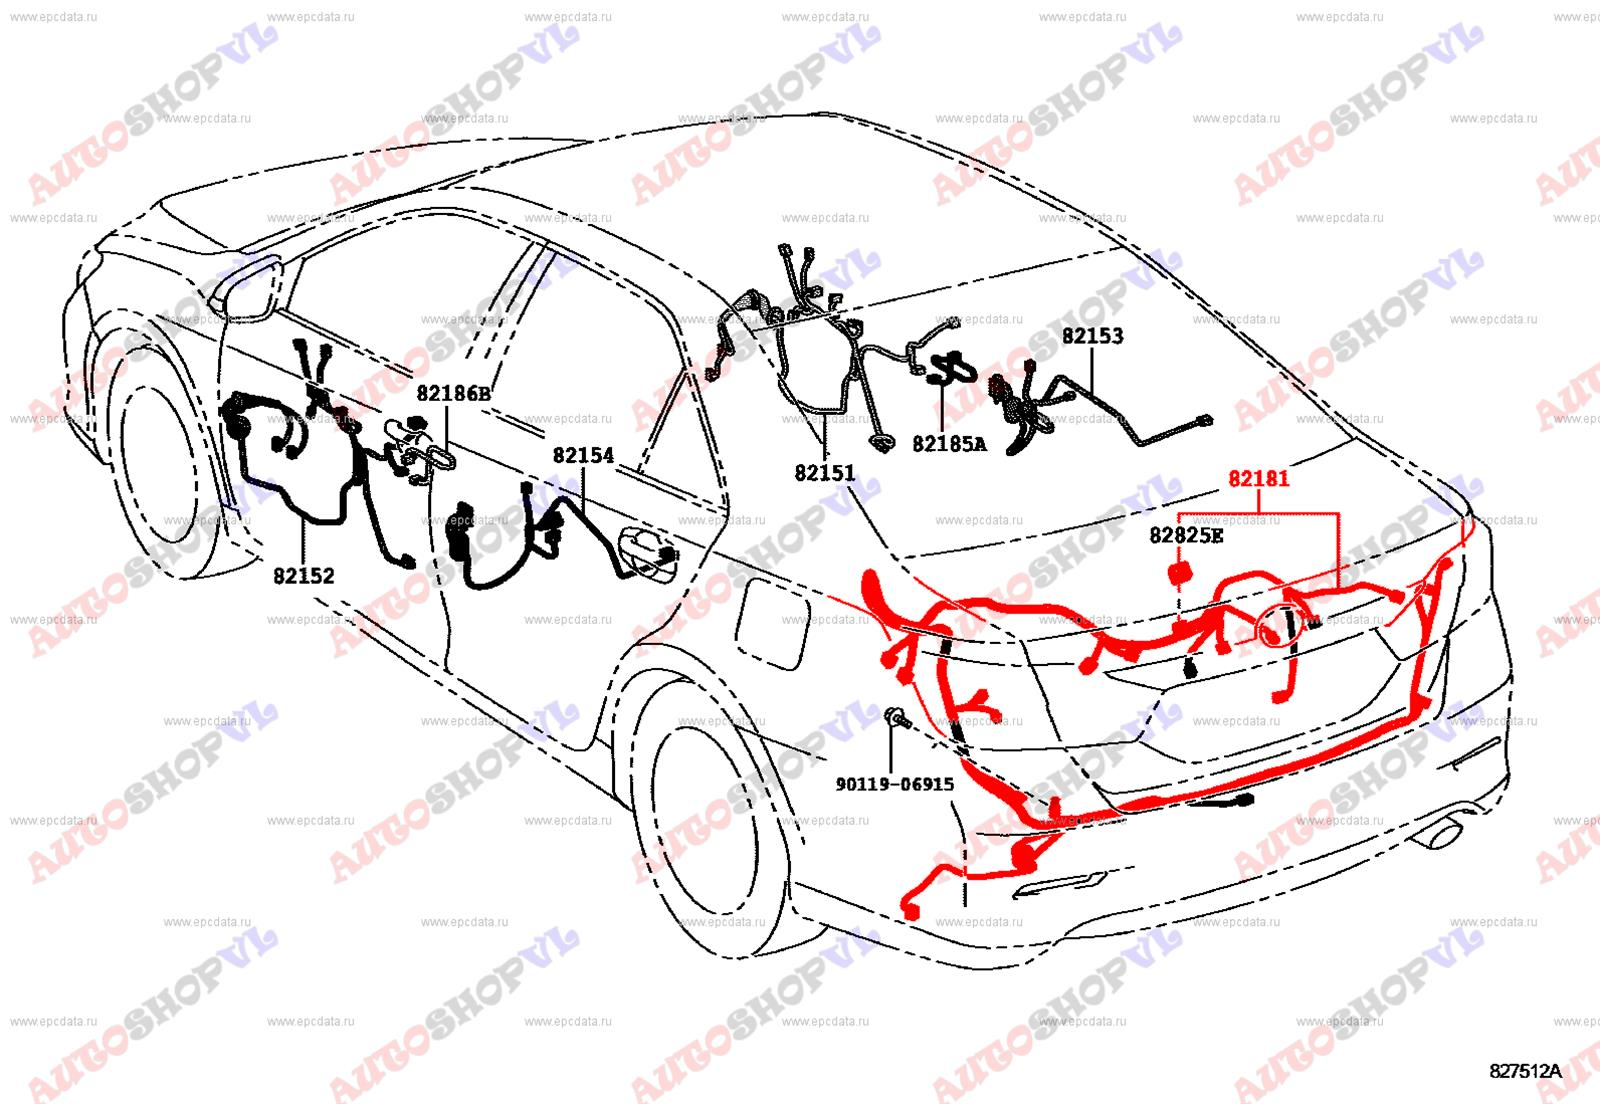 Проводка багажника Toyota Camry AVV50 2ARFXE 12.2011 (б/у)